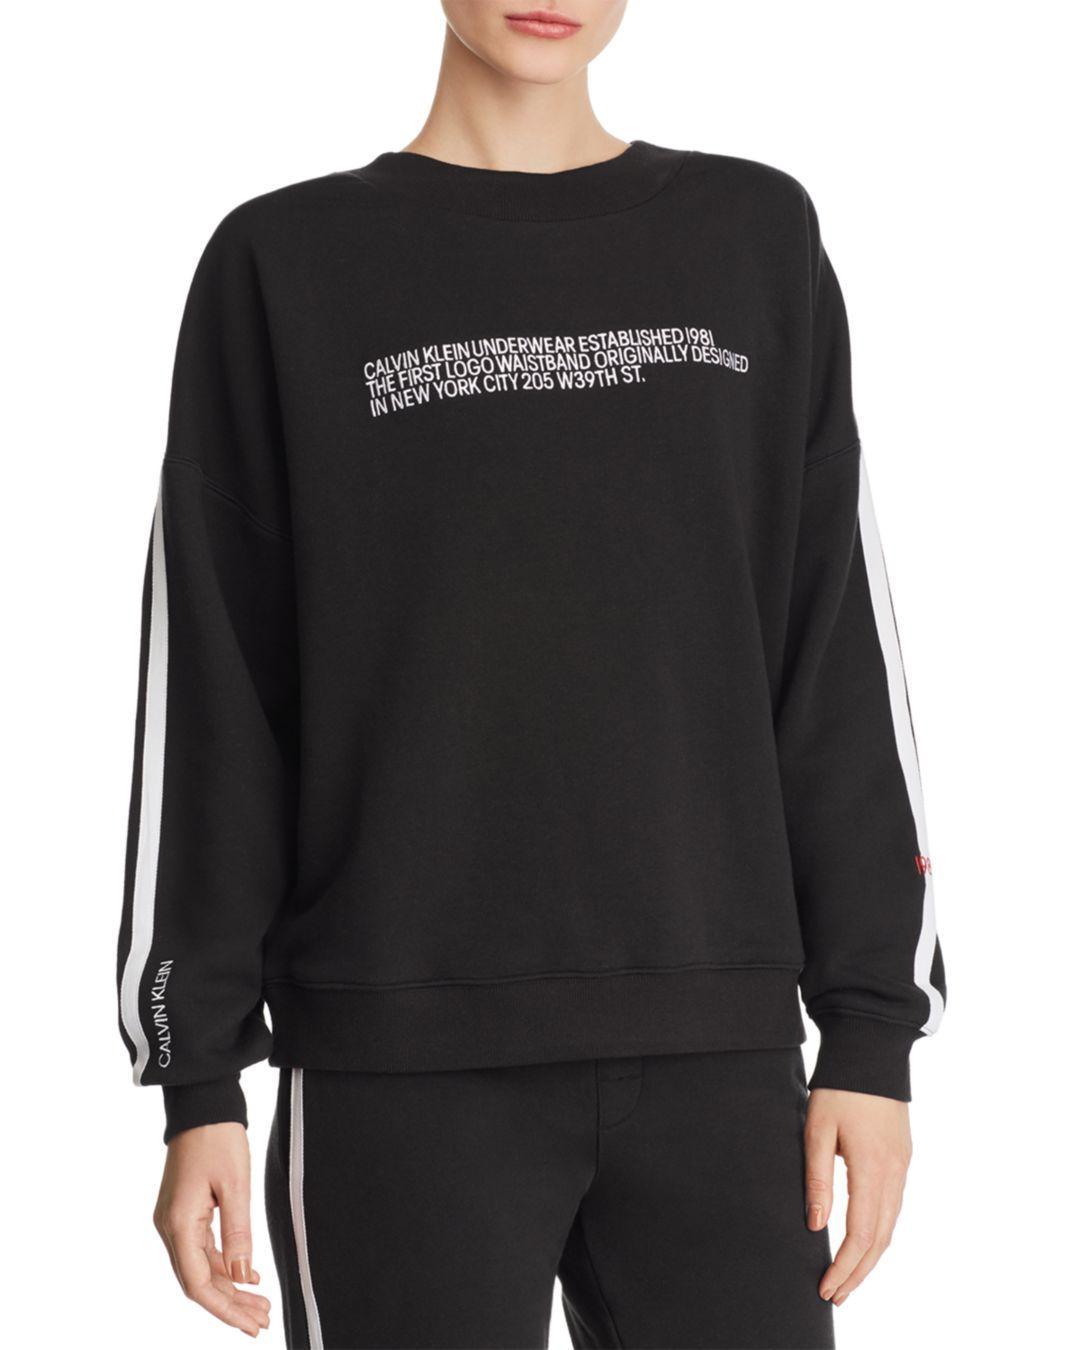 63cf79075a3 Calvin Klein - Gray Statement 1981 Sweatshirt - Lyst. View fullscreen